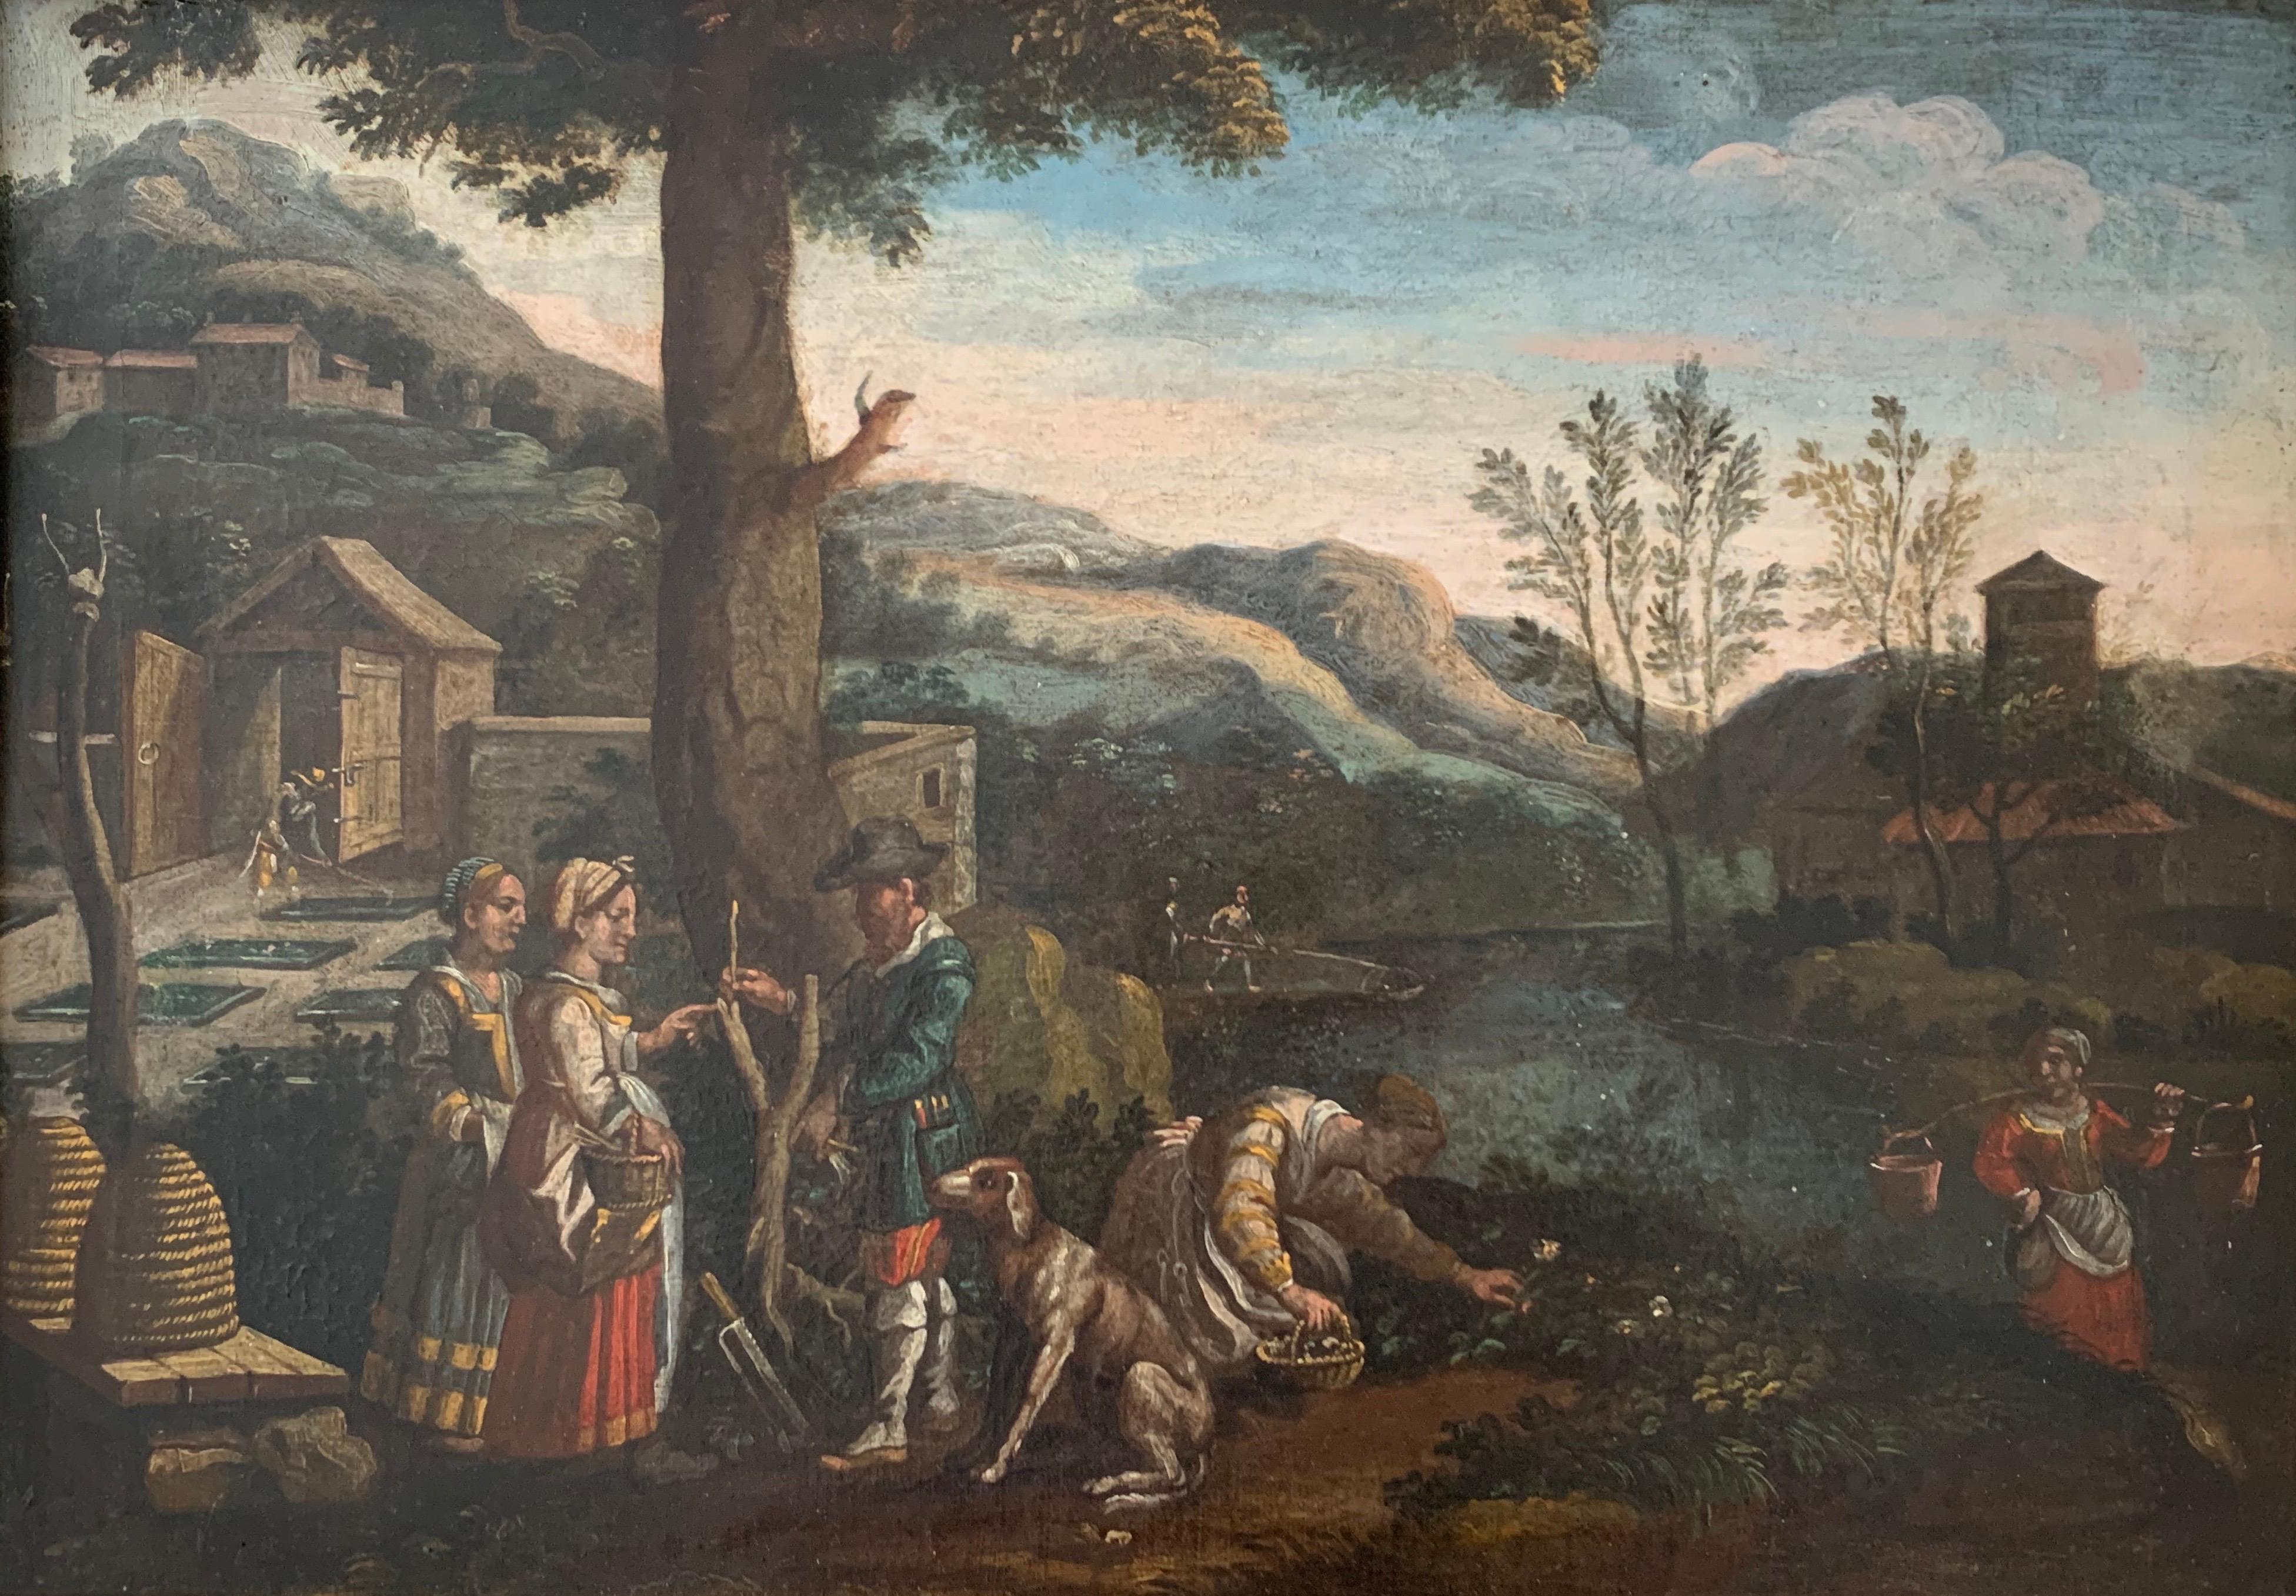 FINE 17th CENTURY ITALIAN OLD MASTER OIL PAINTING - FIGURES GARDENING LANDSCAPE